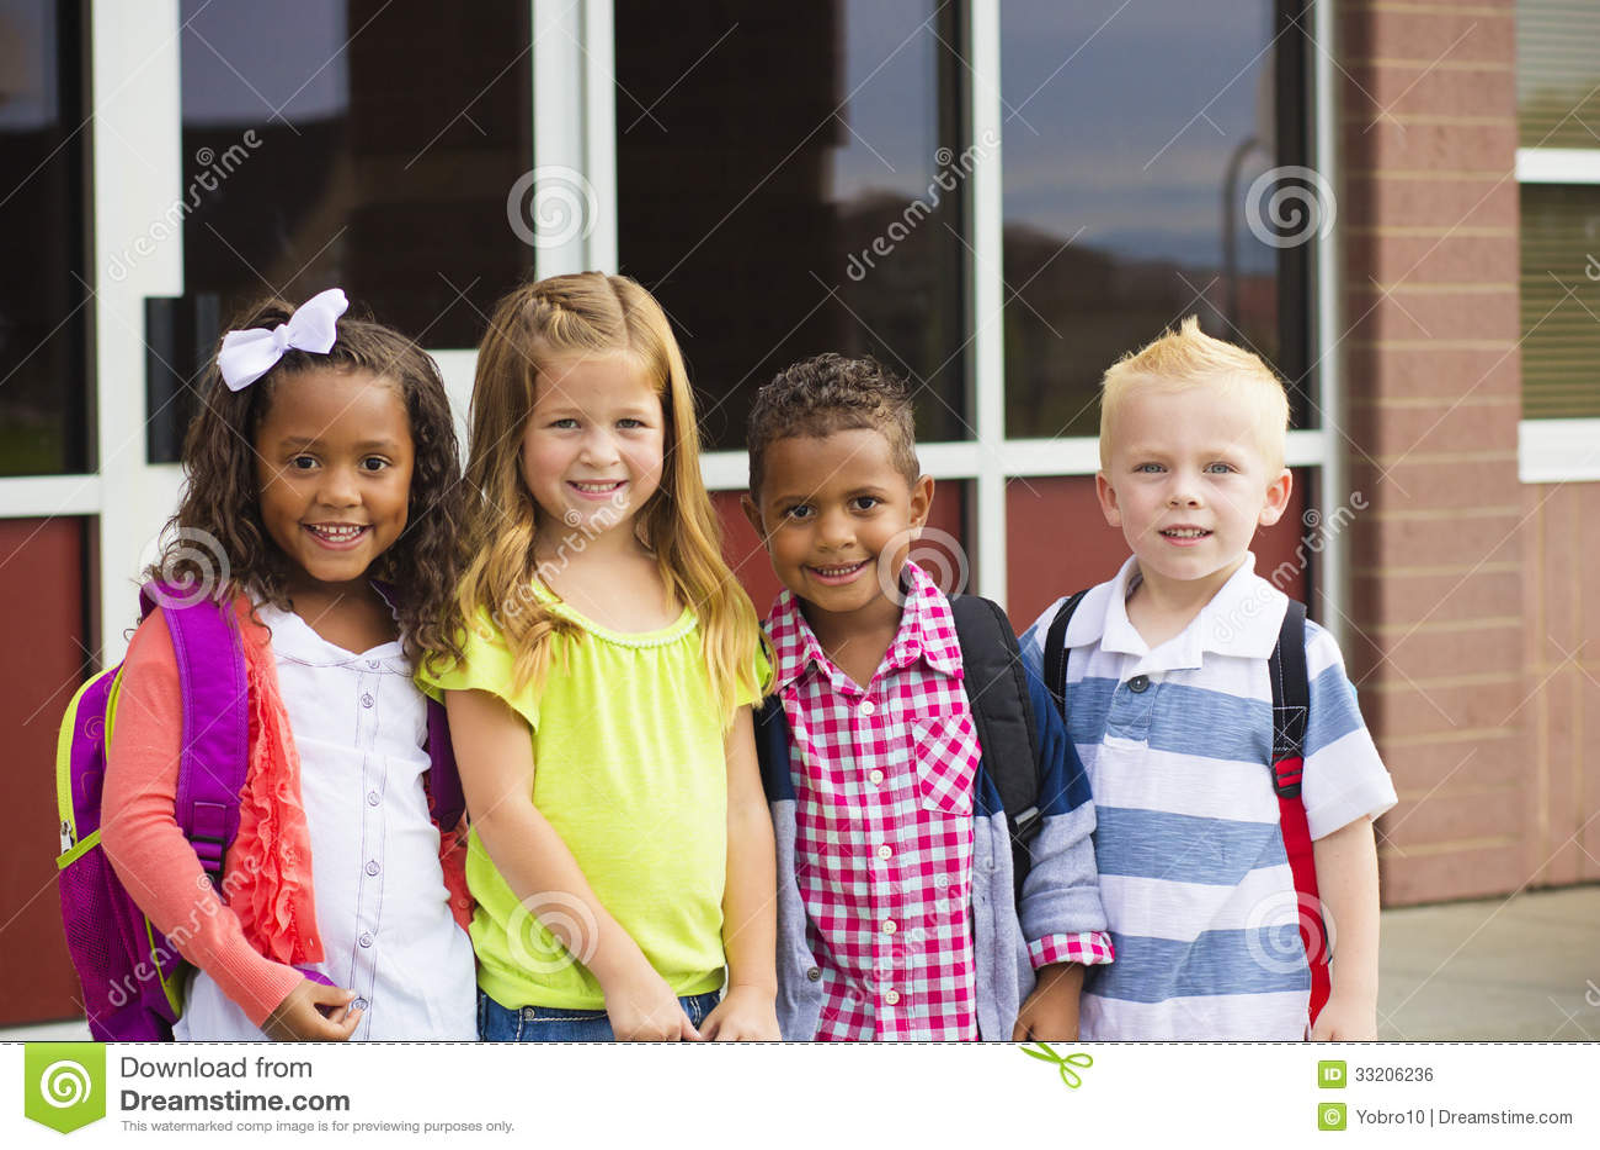 when do children go to preschool going to school stock photo image of grade 959